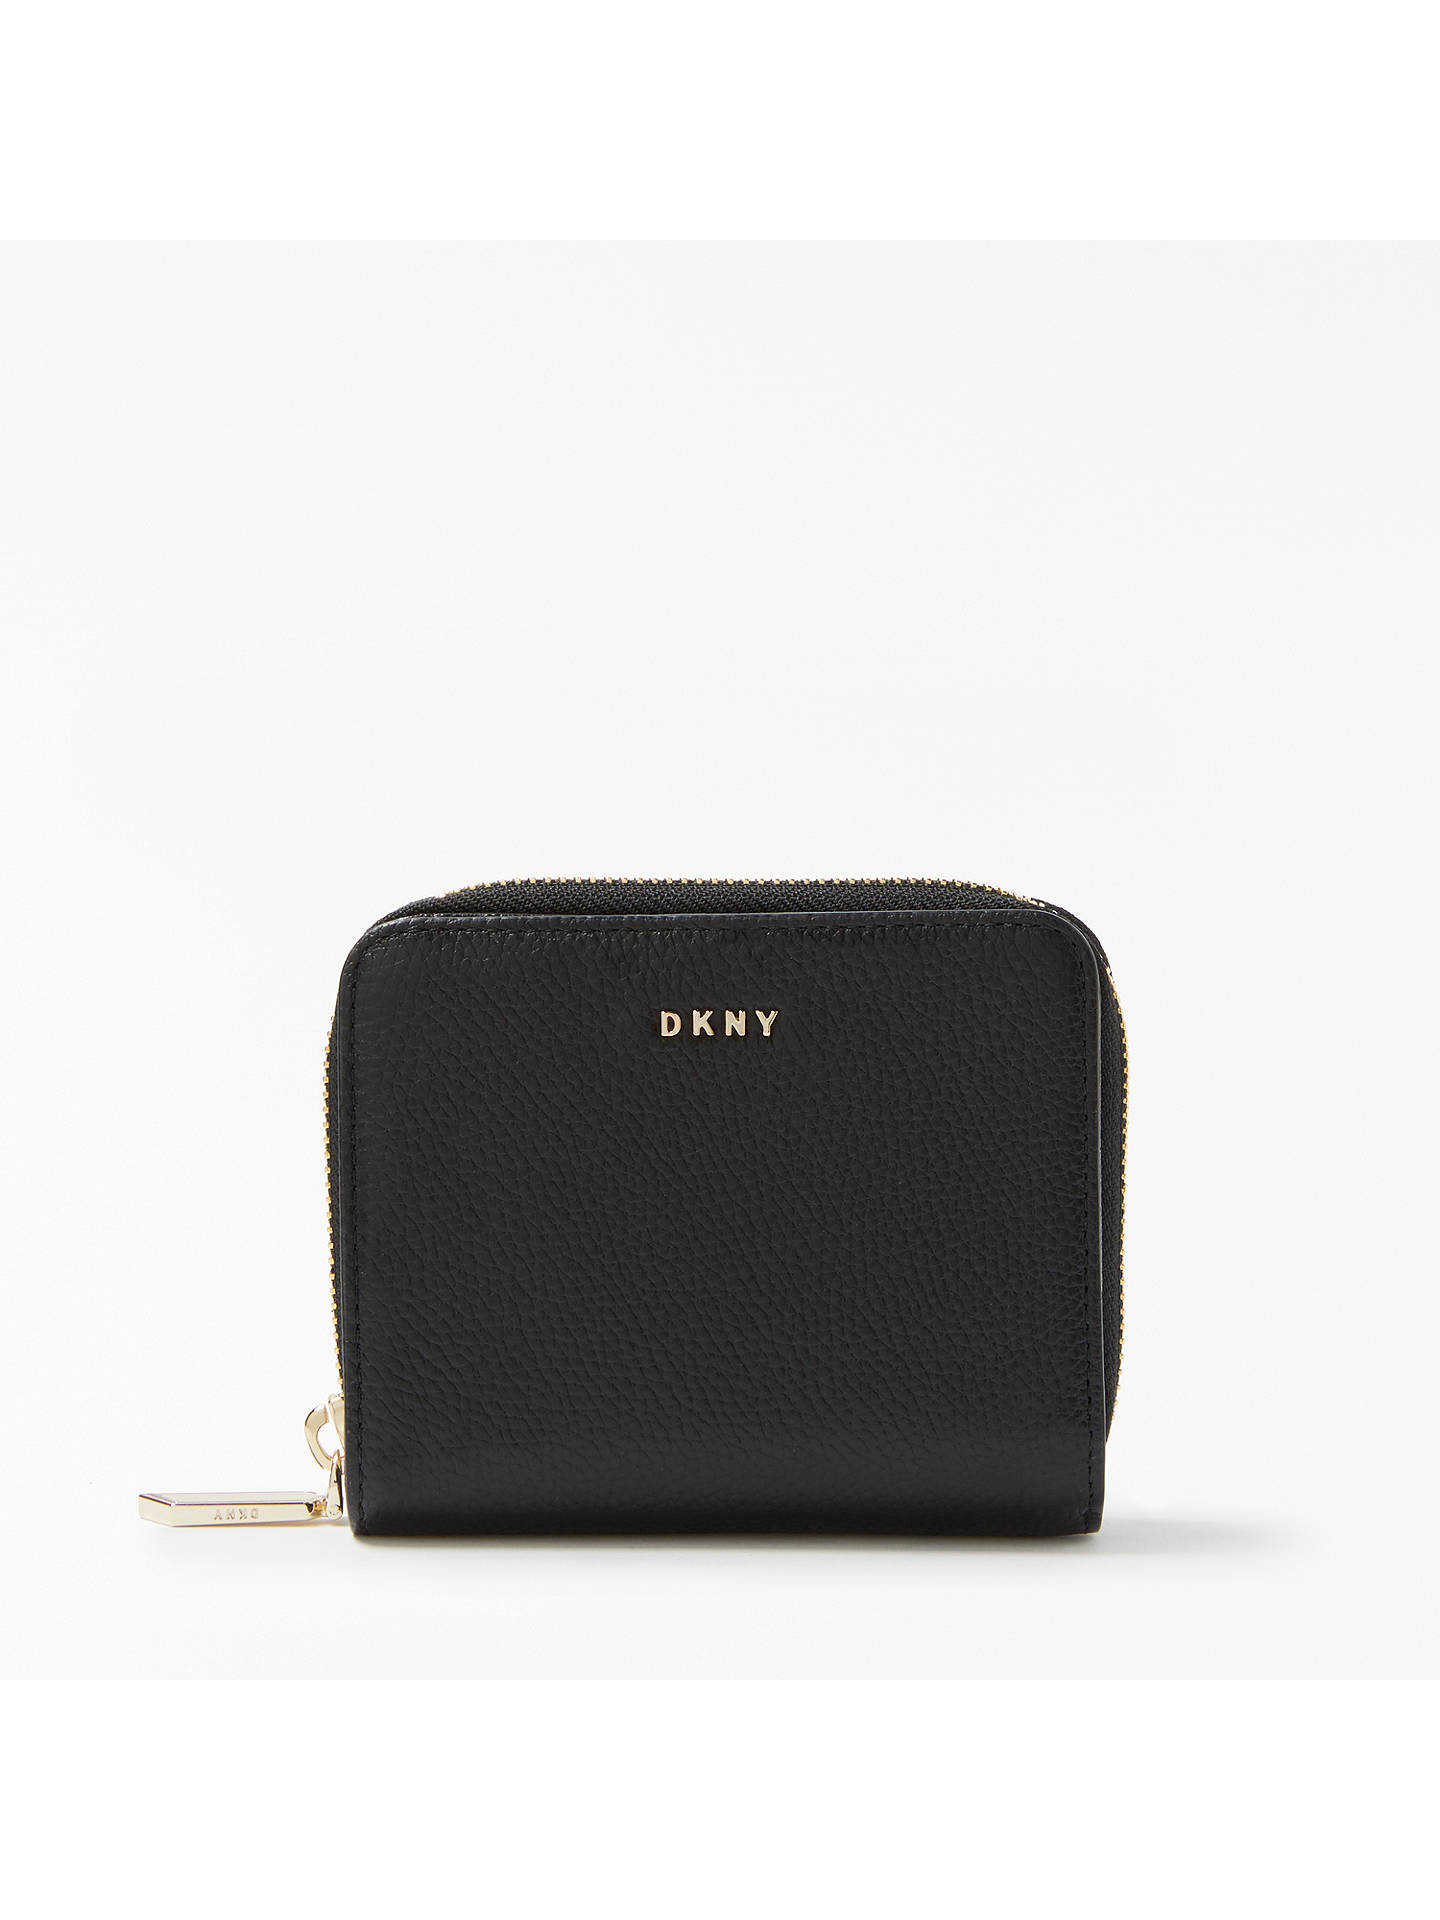 2d8ecbe2b89 BuyDKNY Chelsea Pebbled Leather Carryall Purse, Black Online at  johnlewis.com ...